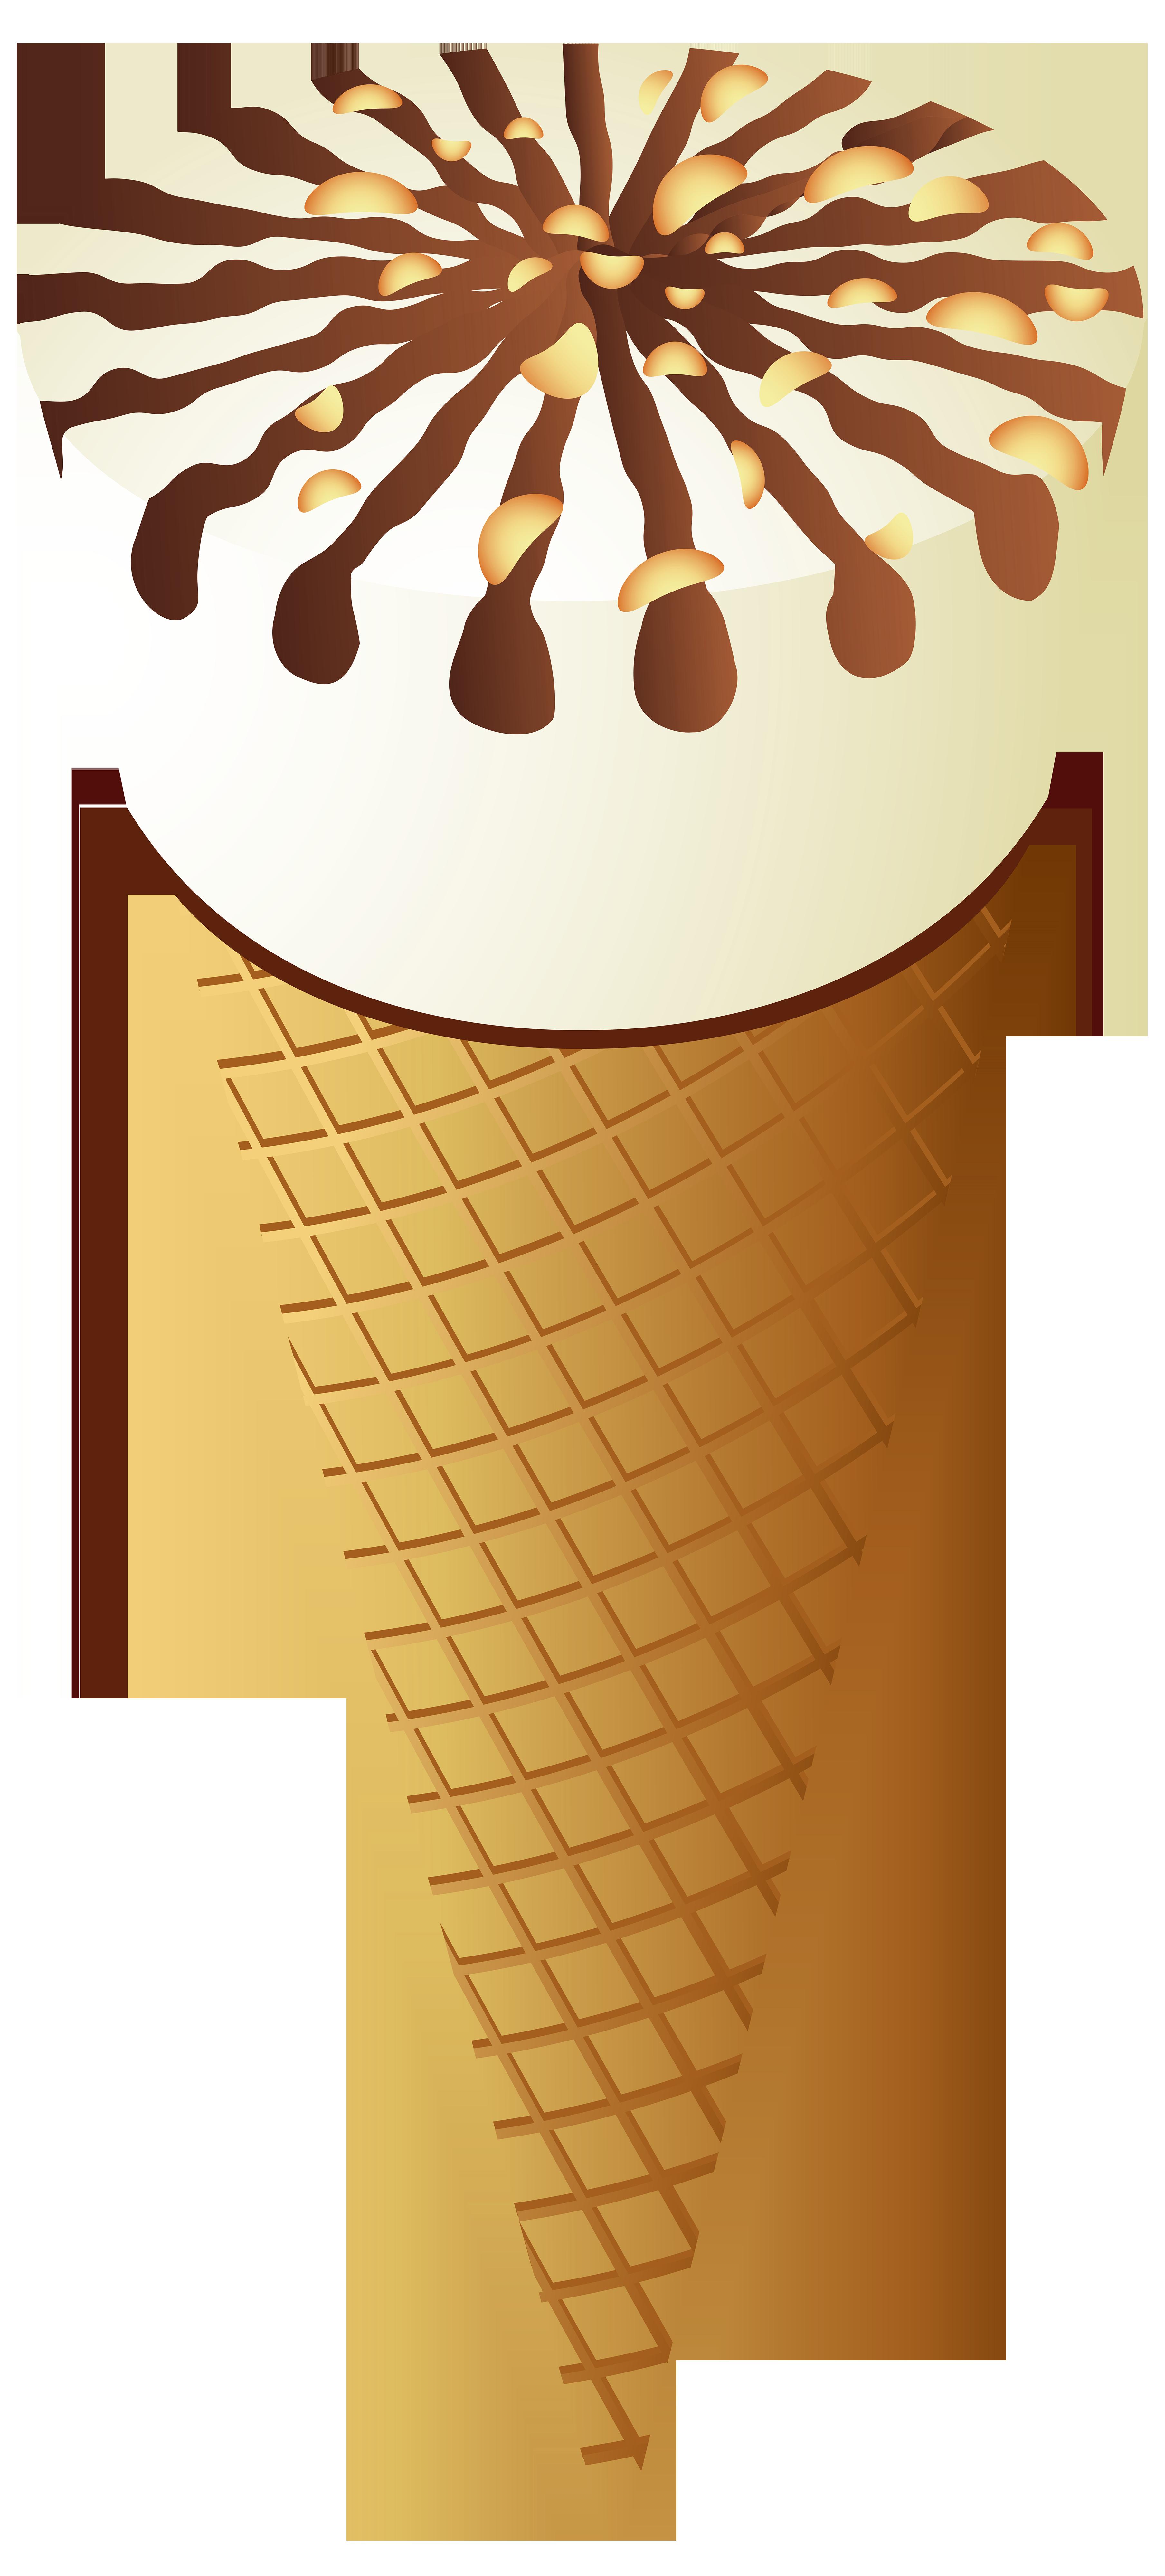 Ice cream cone ice clip art image 9